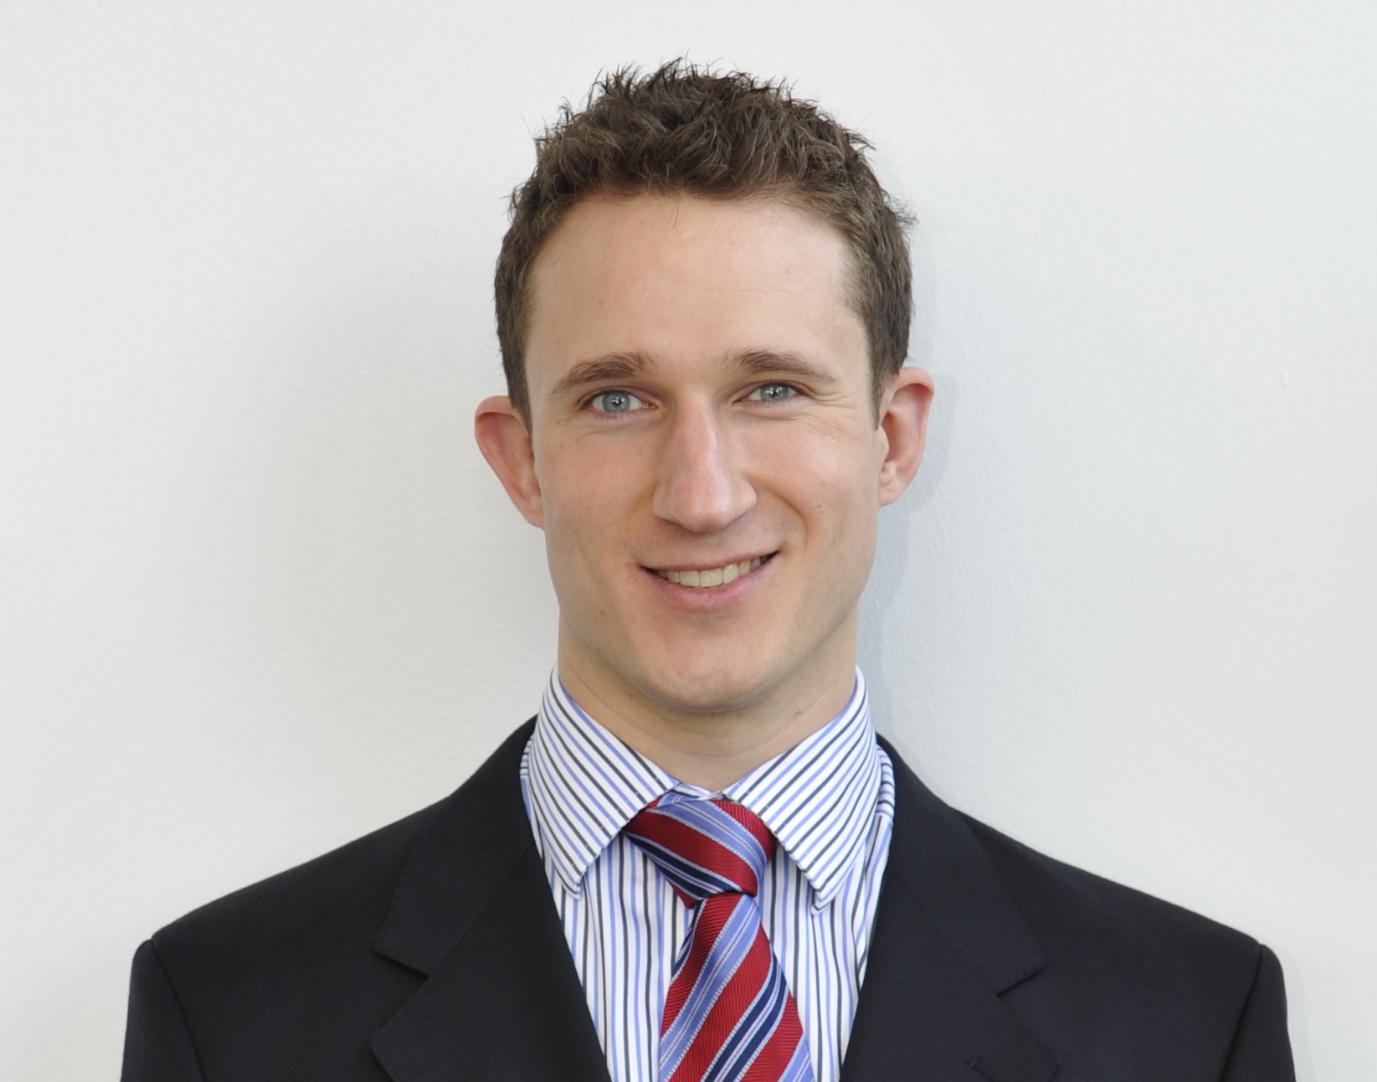 David Lyus, Sales Manager - Industrial and Digital for GEW and InPrint Ambassador